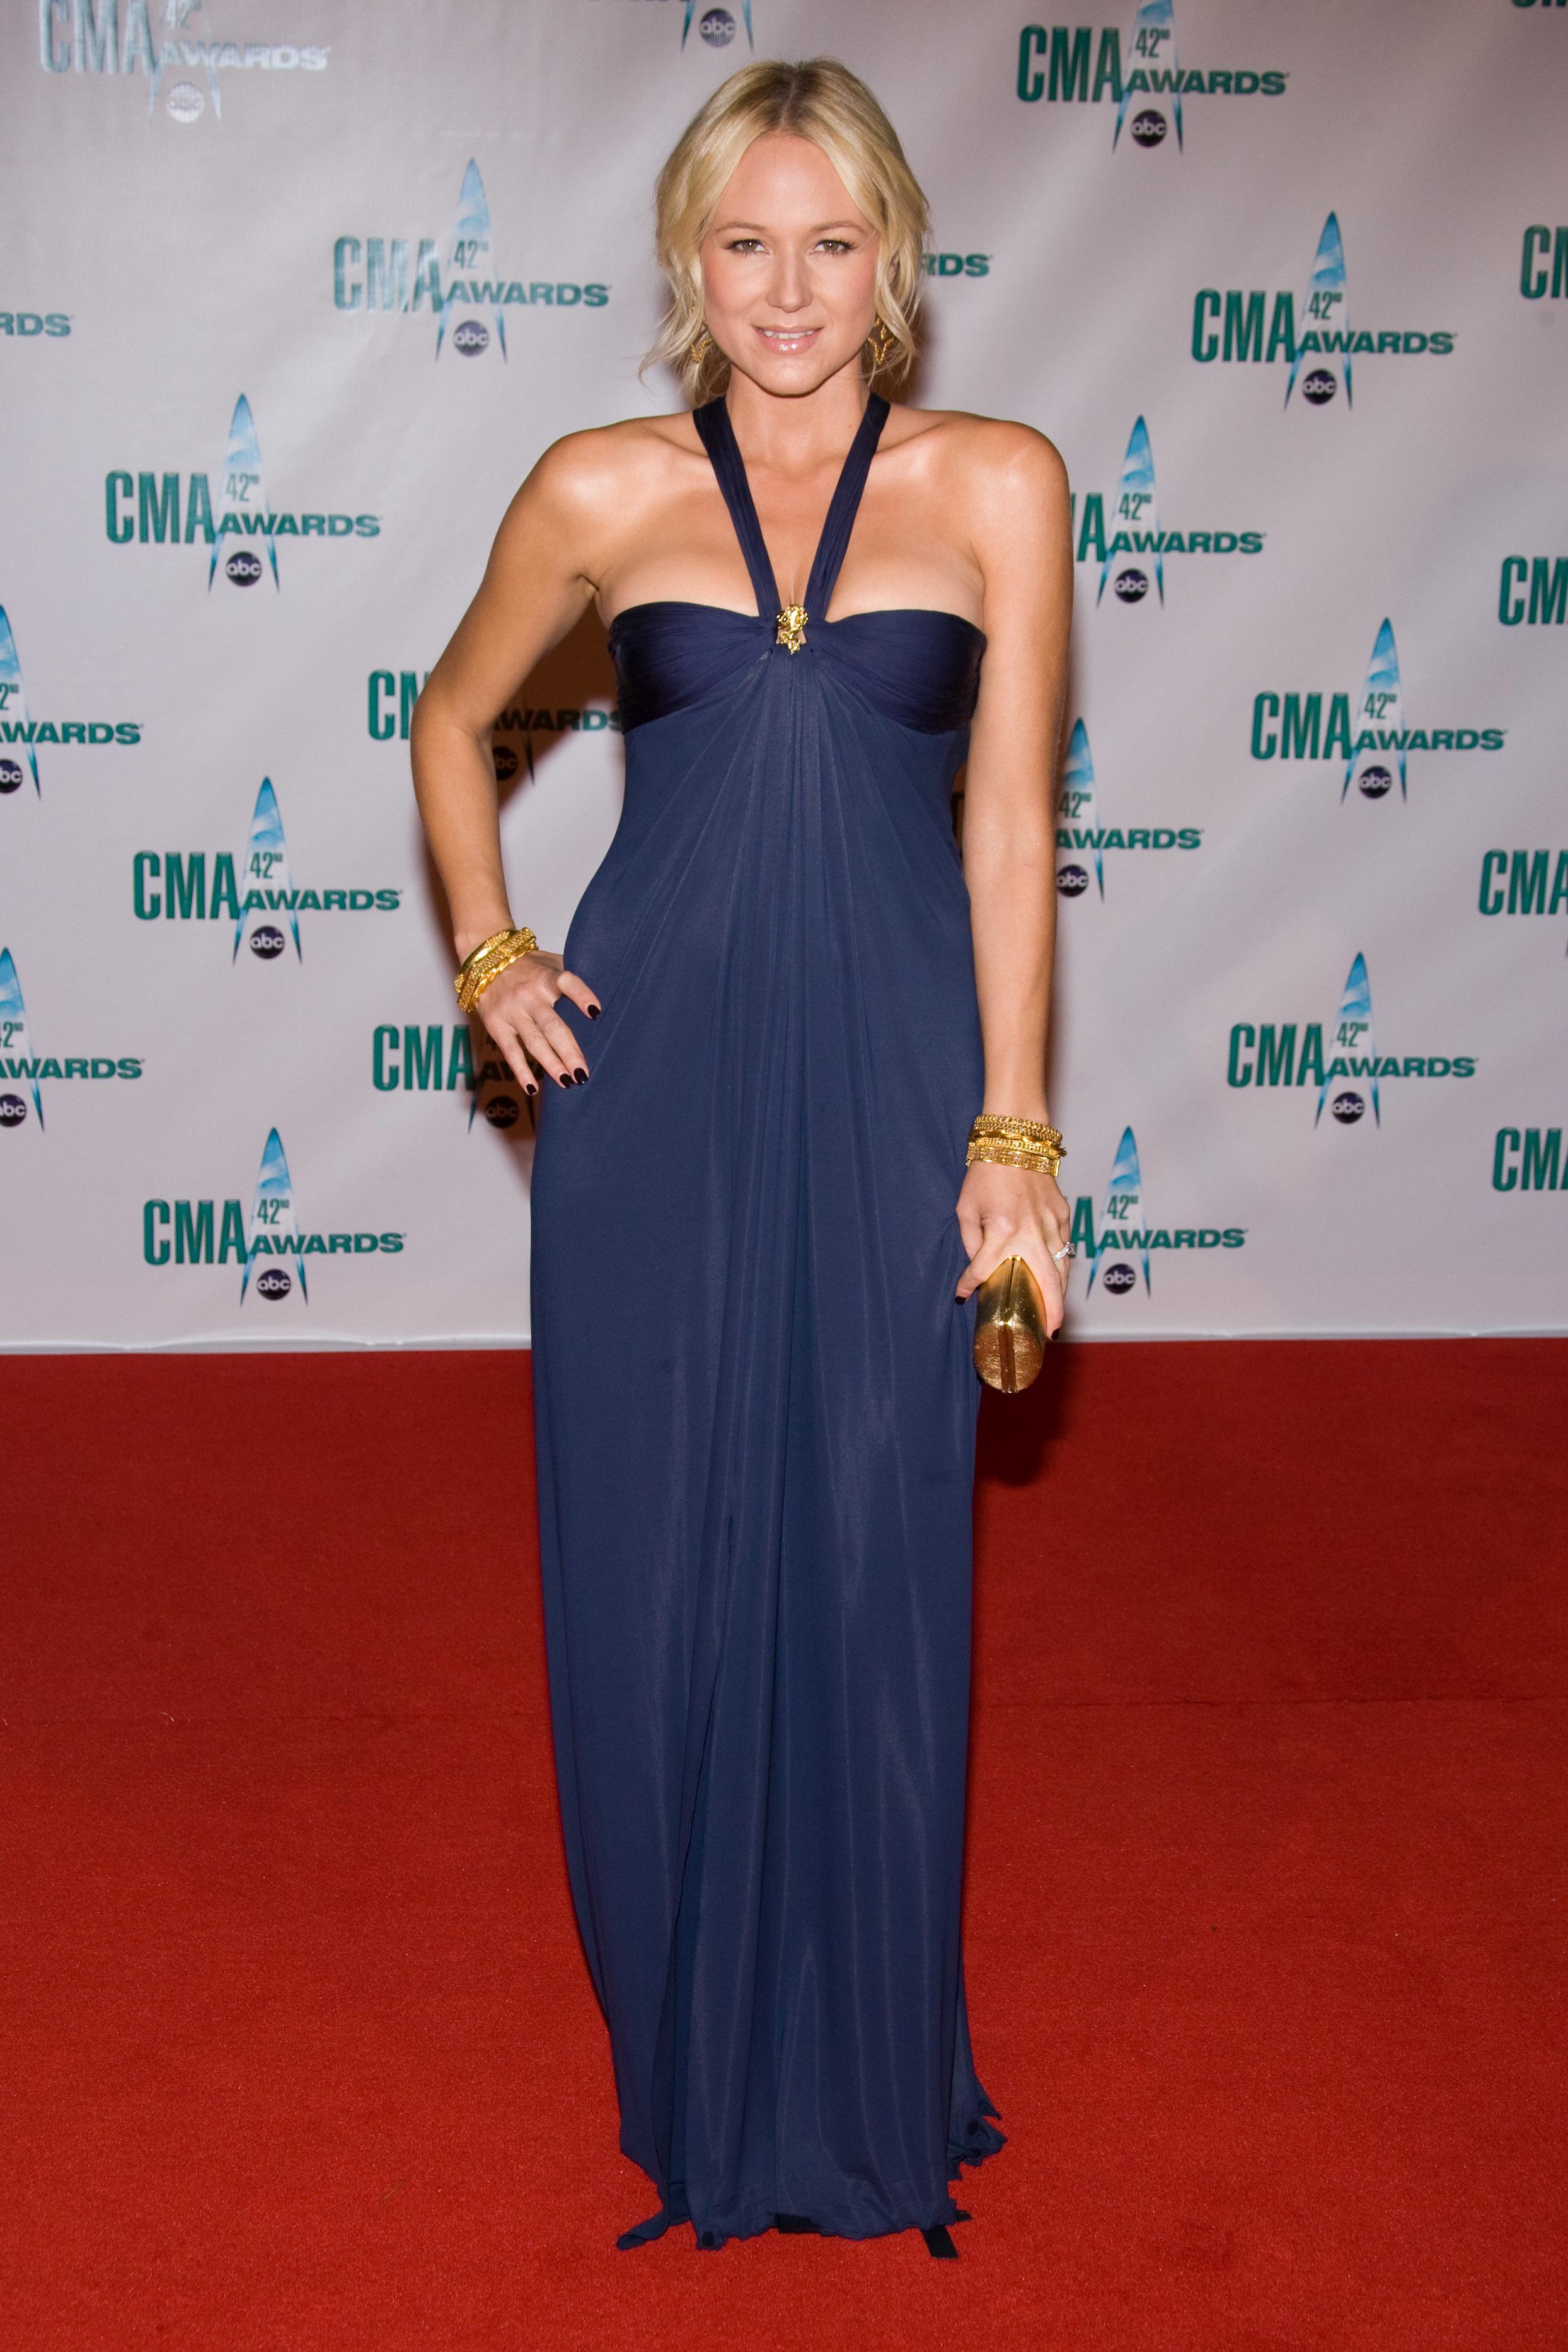 Jewel attends the CMA Awards in Nashville on Nov. 12, 2008.